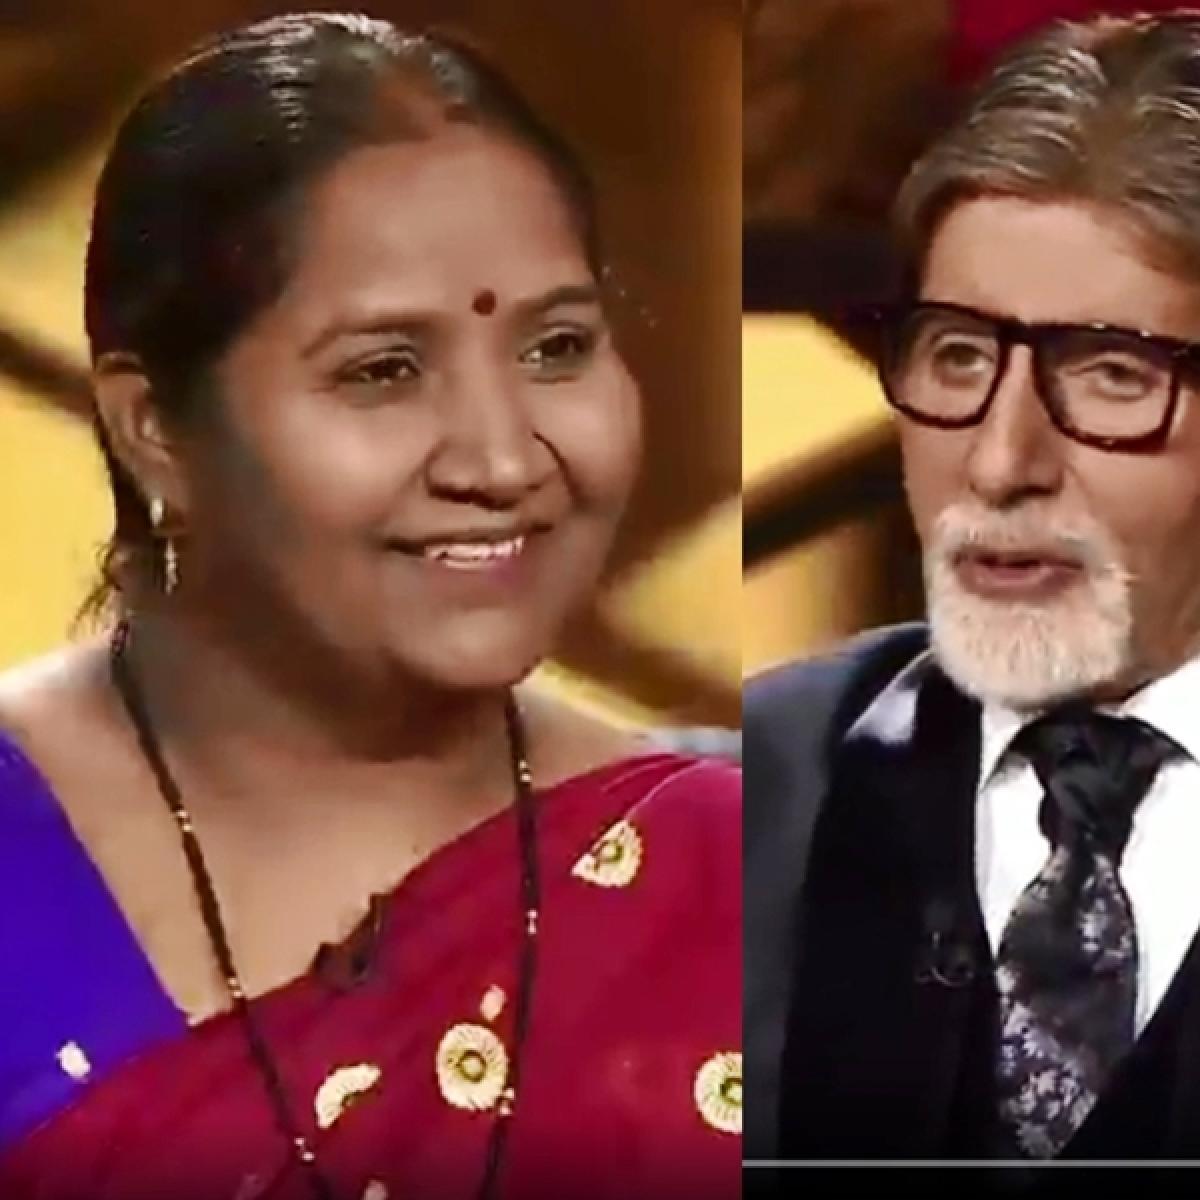 Woman earning Rs 1,500 per month wins Rs 1 Crore on 'Kaun Banega Crorepati' season 11